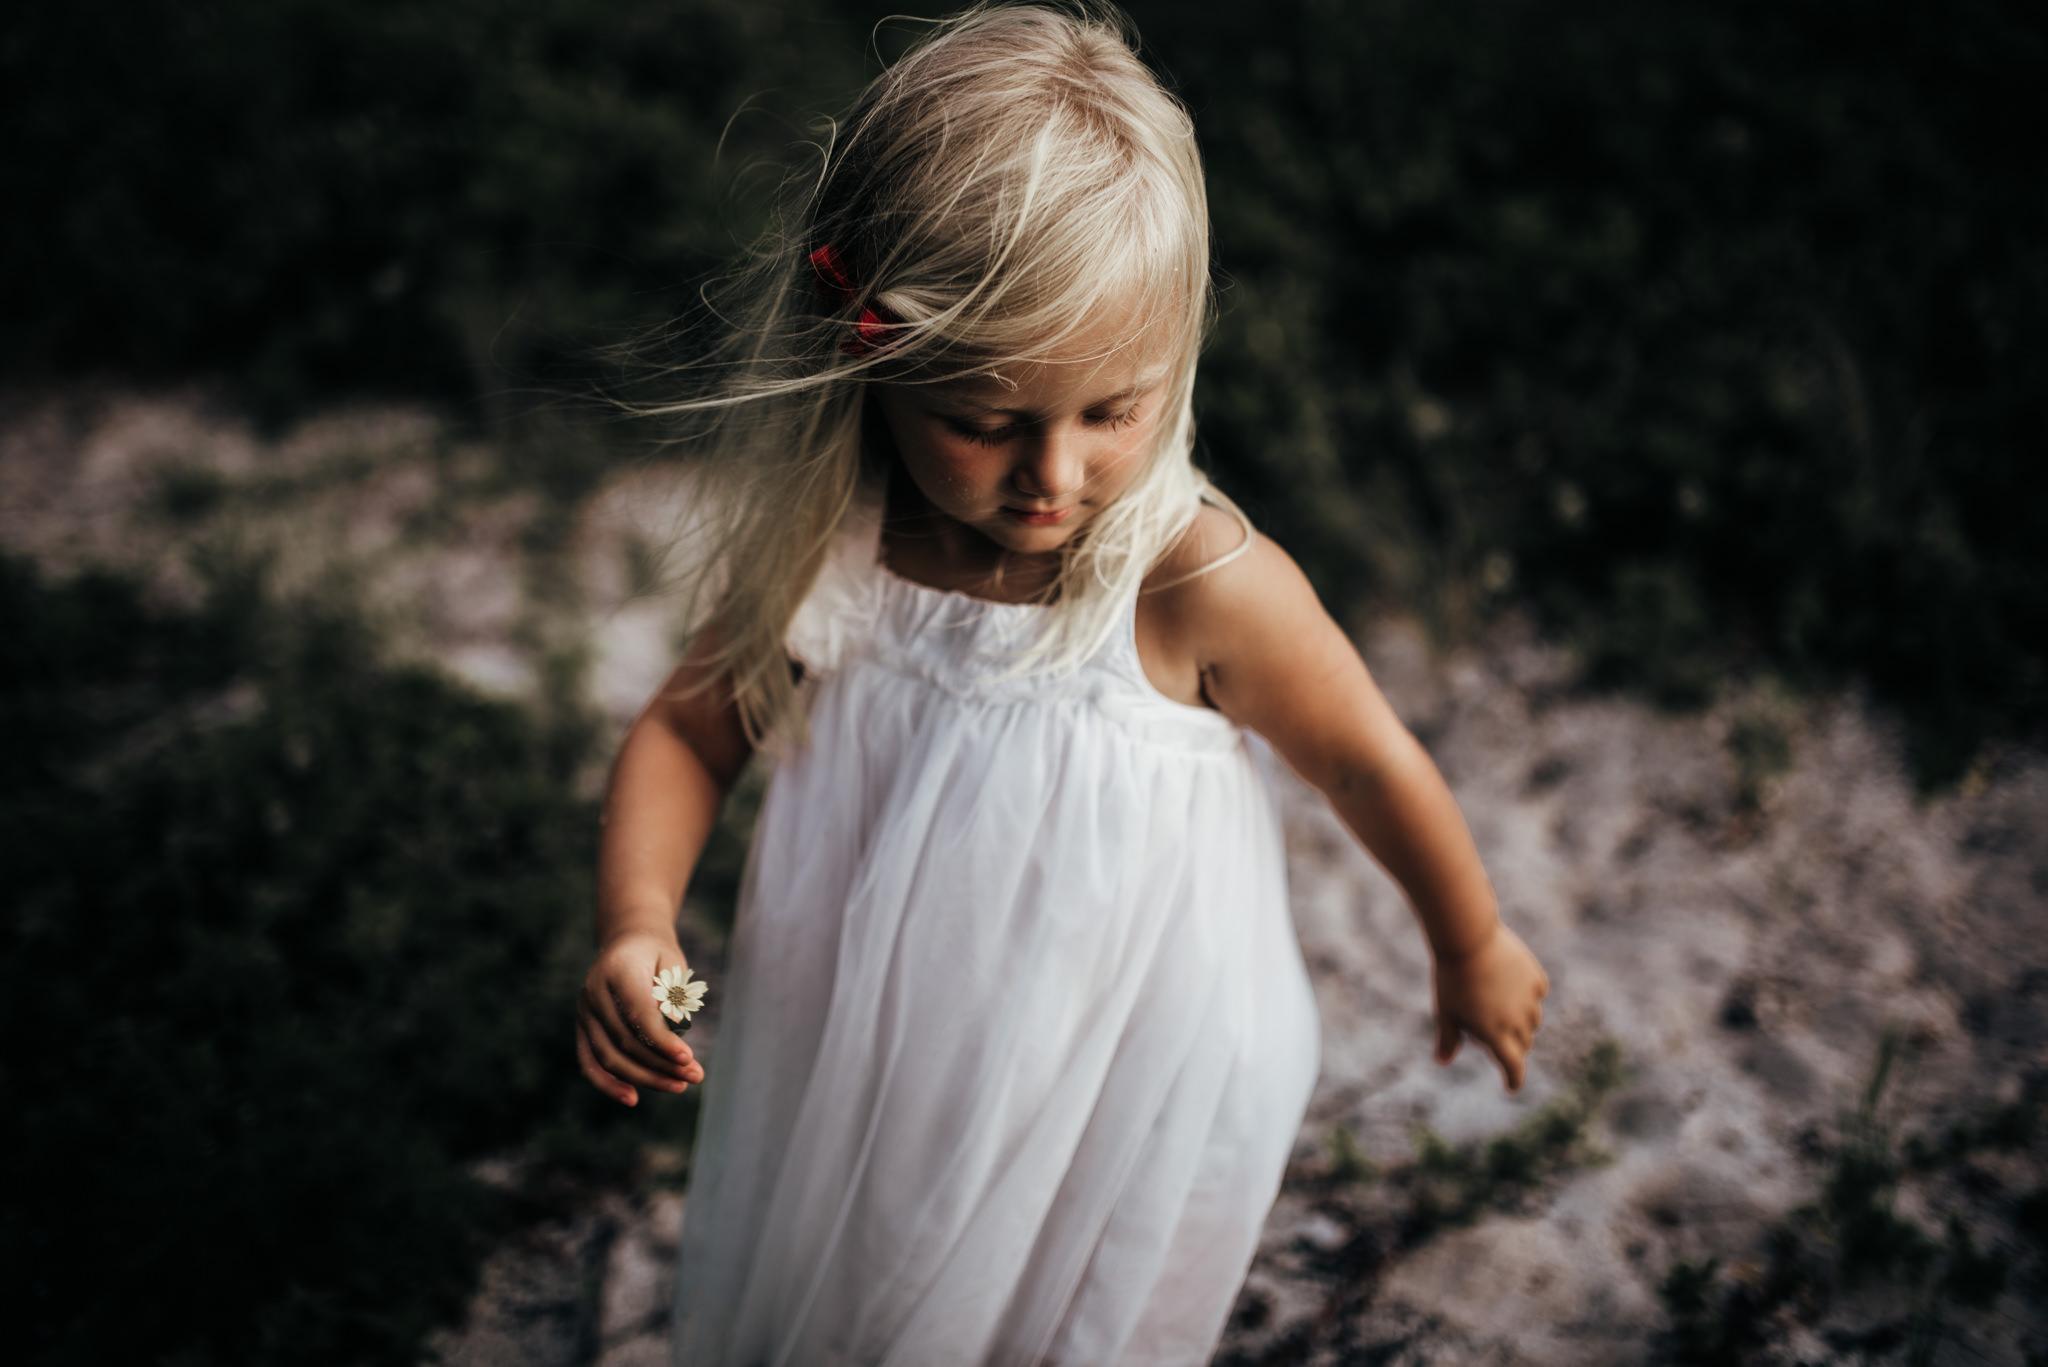 twyla jones photography - treasure coast florida - island family session-5951.jpg